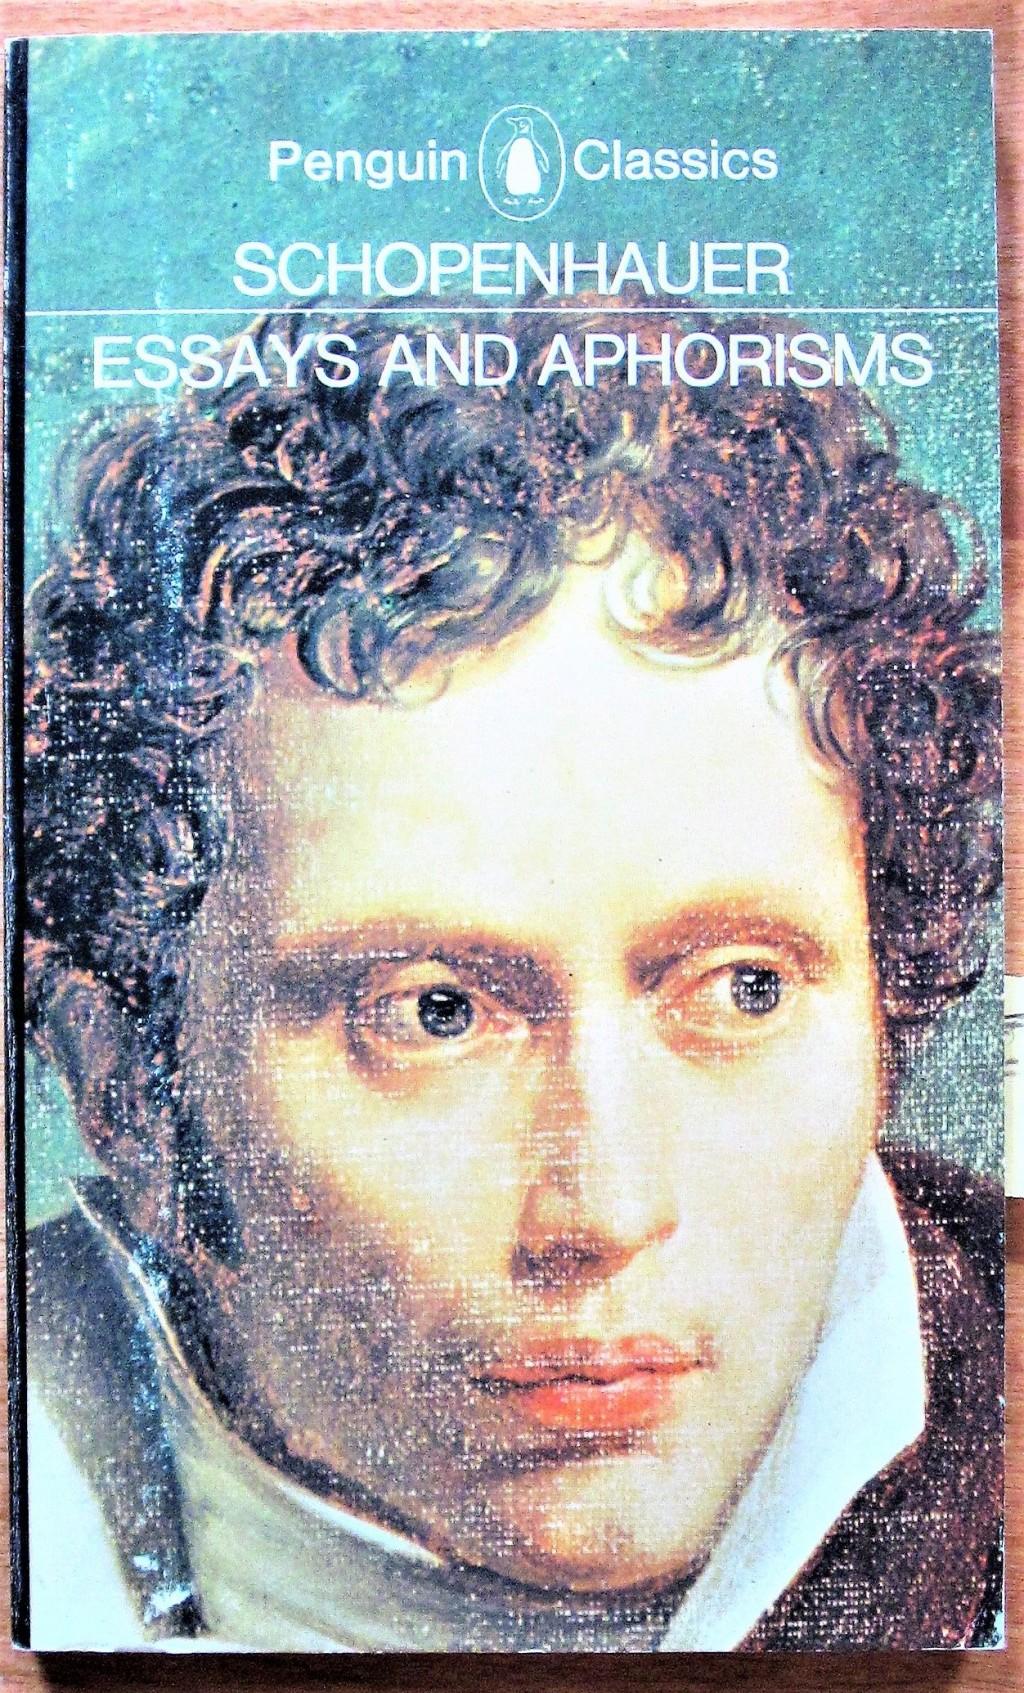 003 Essays And Aphorisms X Essay Frightening Pdf Schopenhauer Large